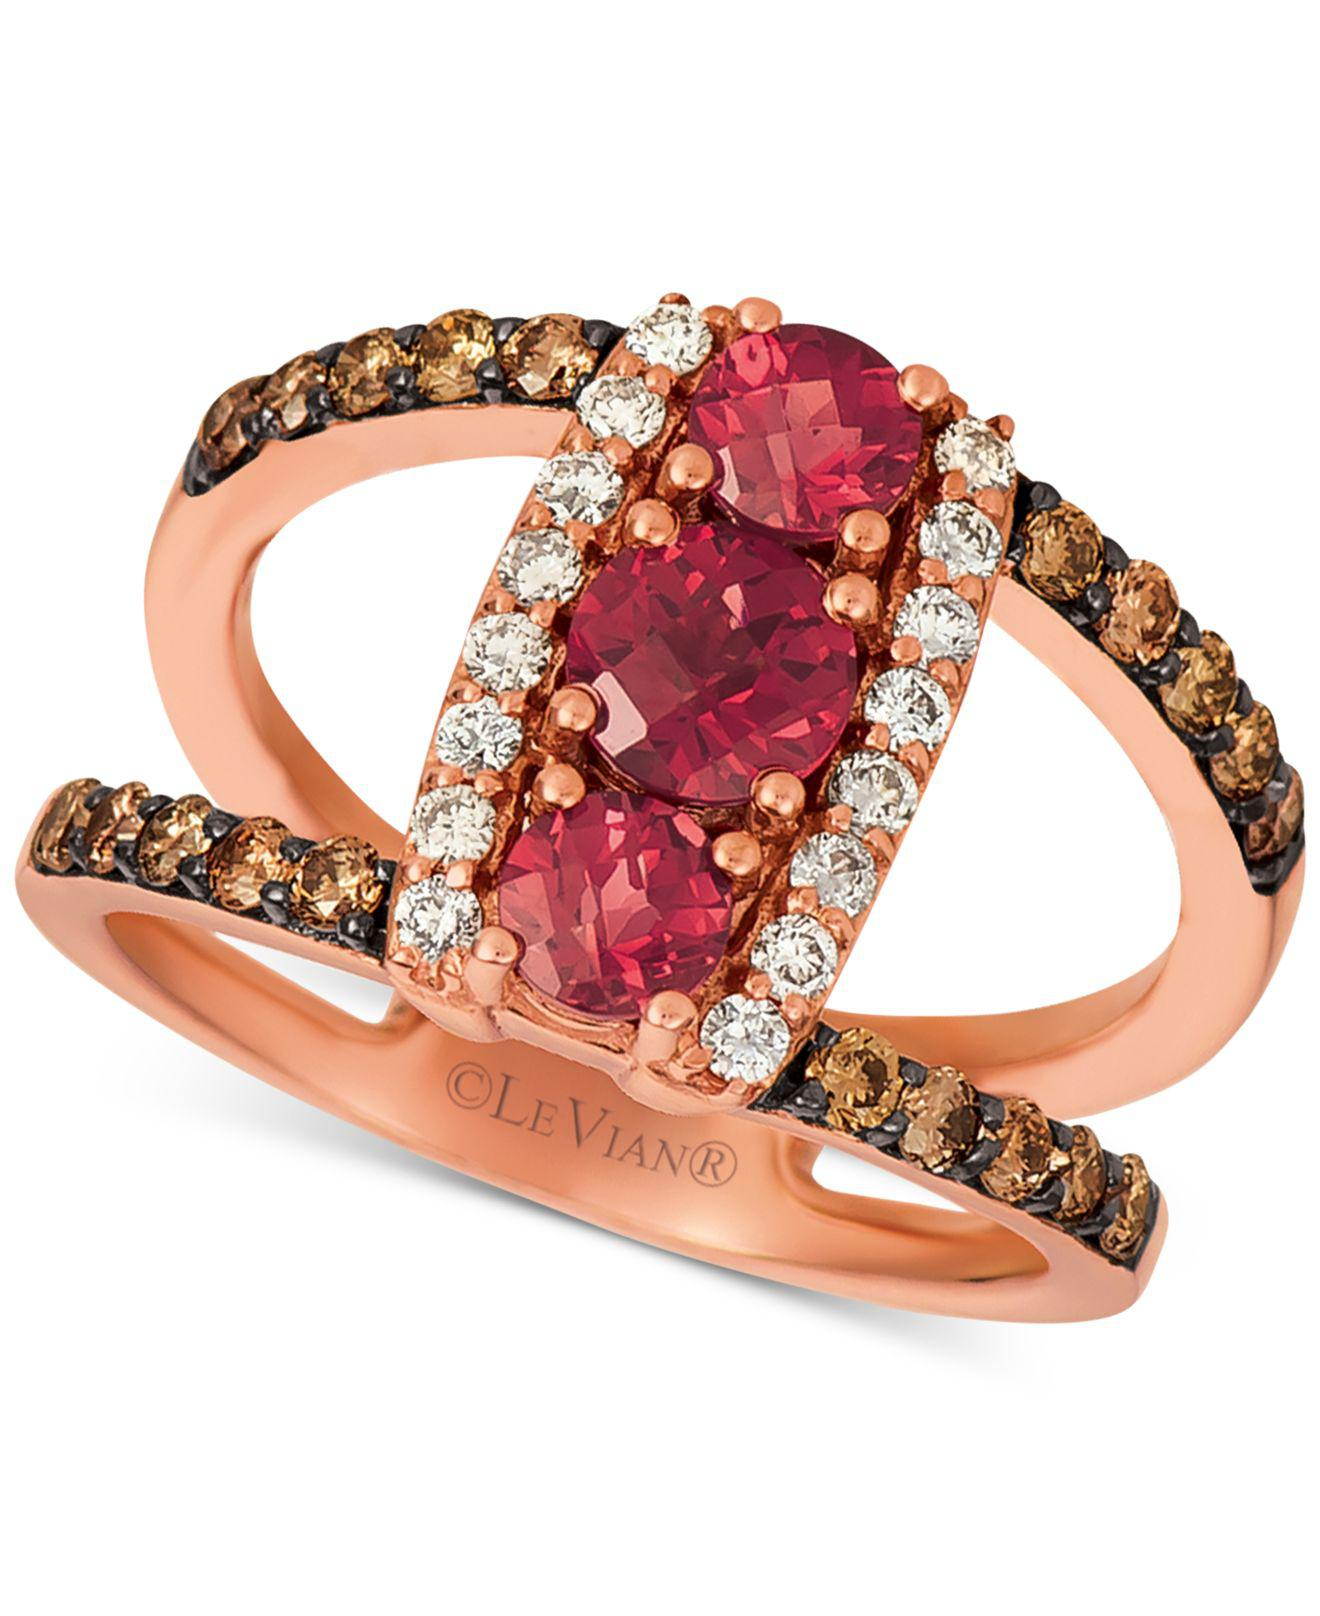 1a4534a6fc258 Women's ® Rhodolite (1 Ct. T.w.) & Nudetm & Chocolatetm Diamond (5/8 Ct.  T.w.) Statement Ring In 14k Rose Gold